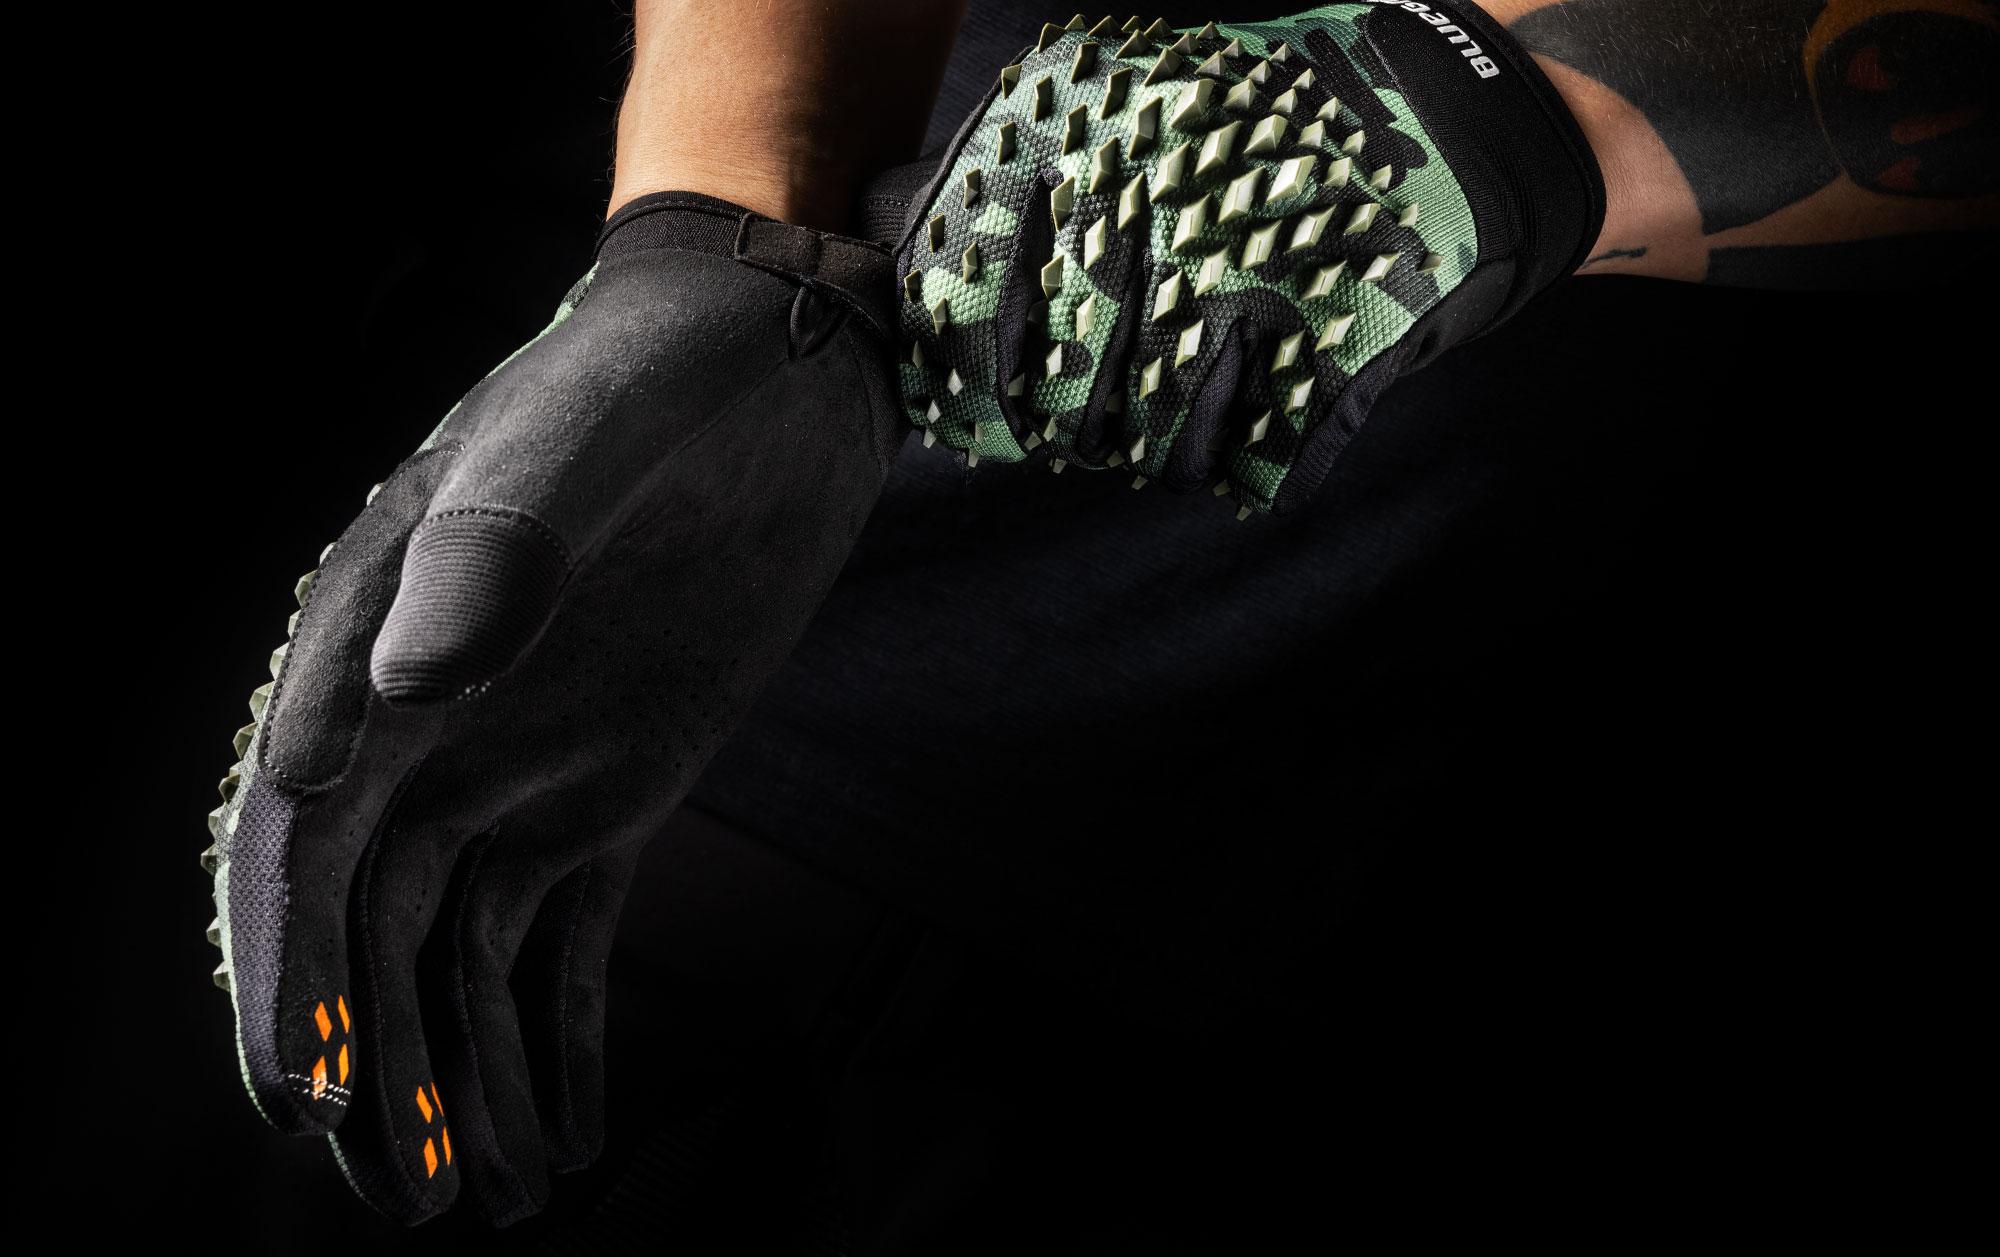 Bluegrass Prizma 3D MTB Glove for DH, Enduro, Trail, and BMX